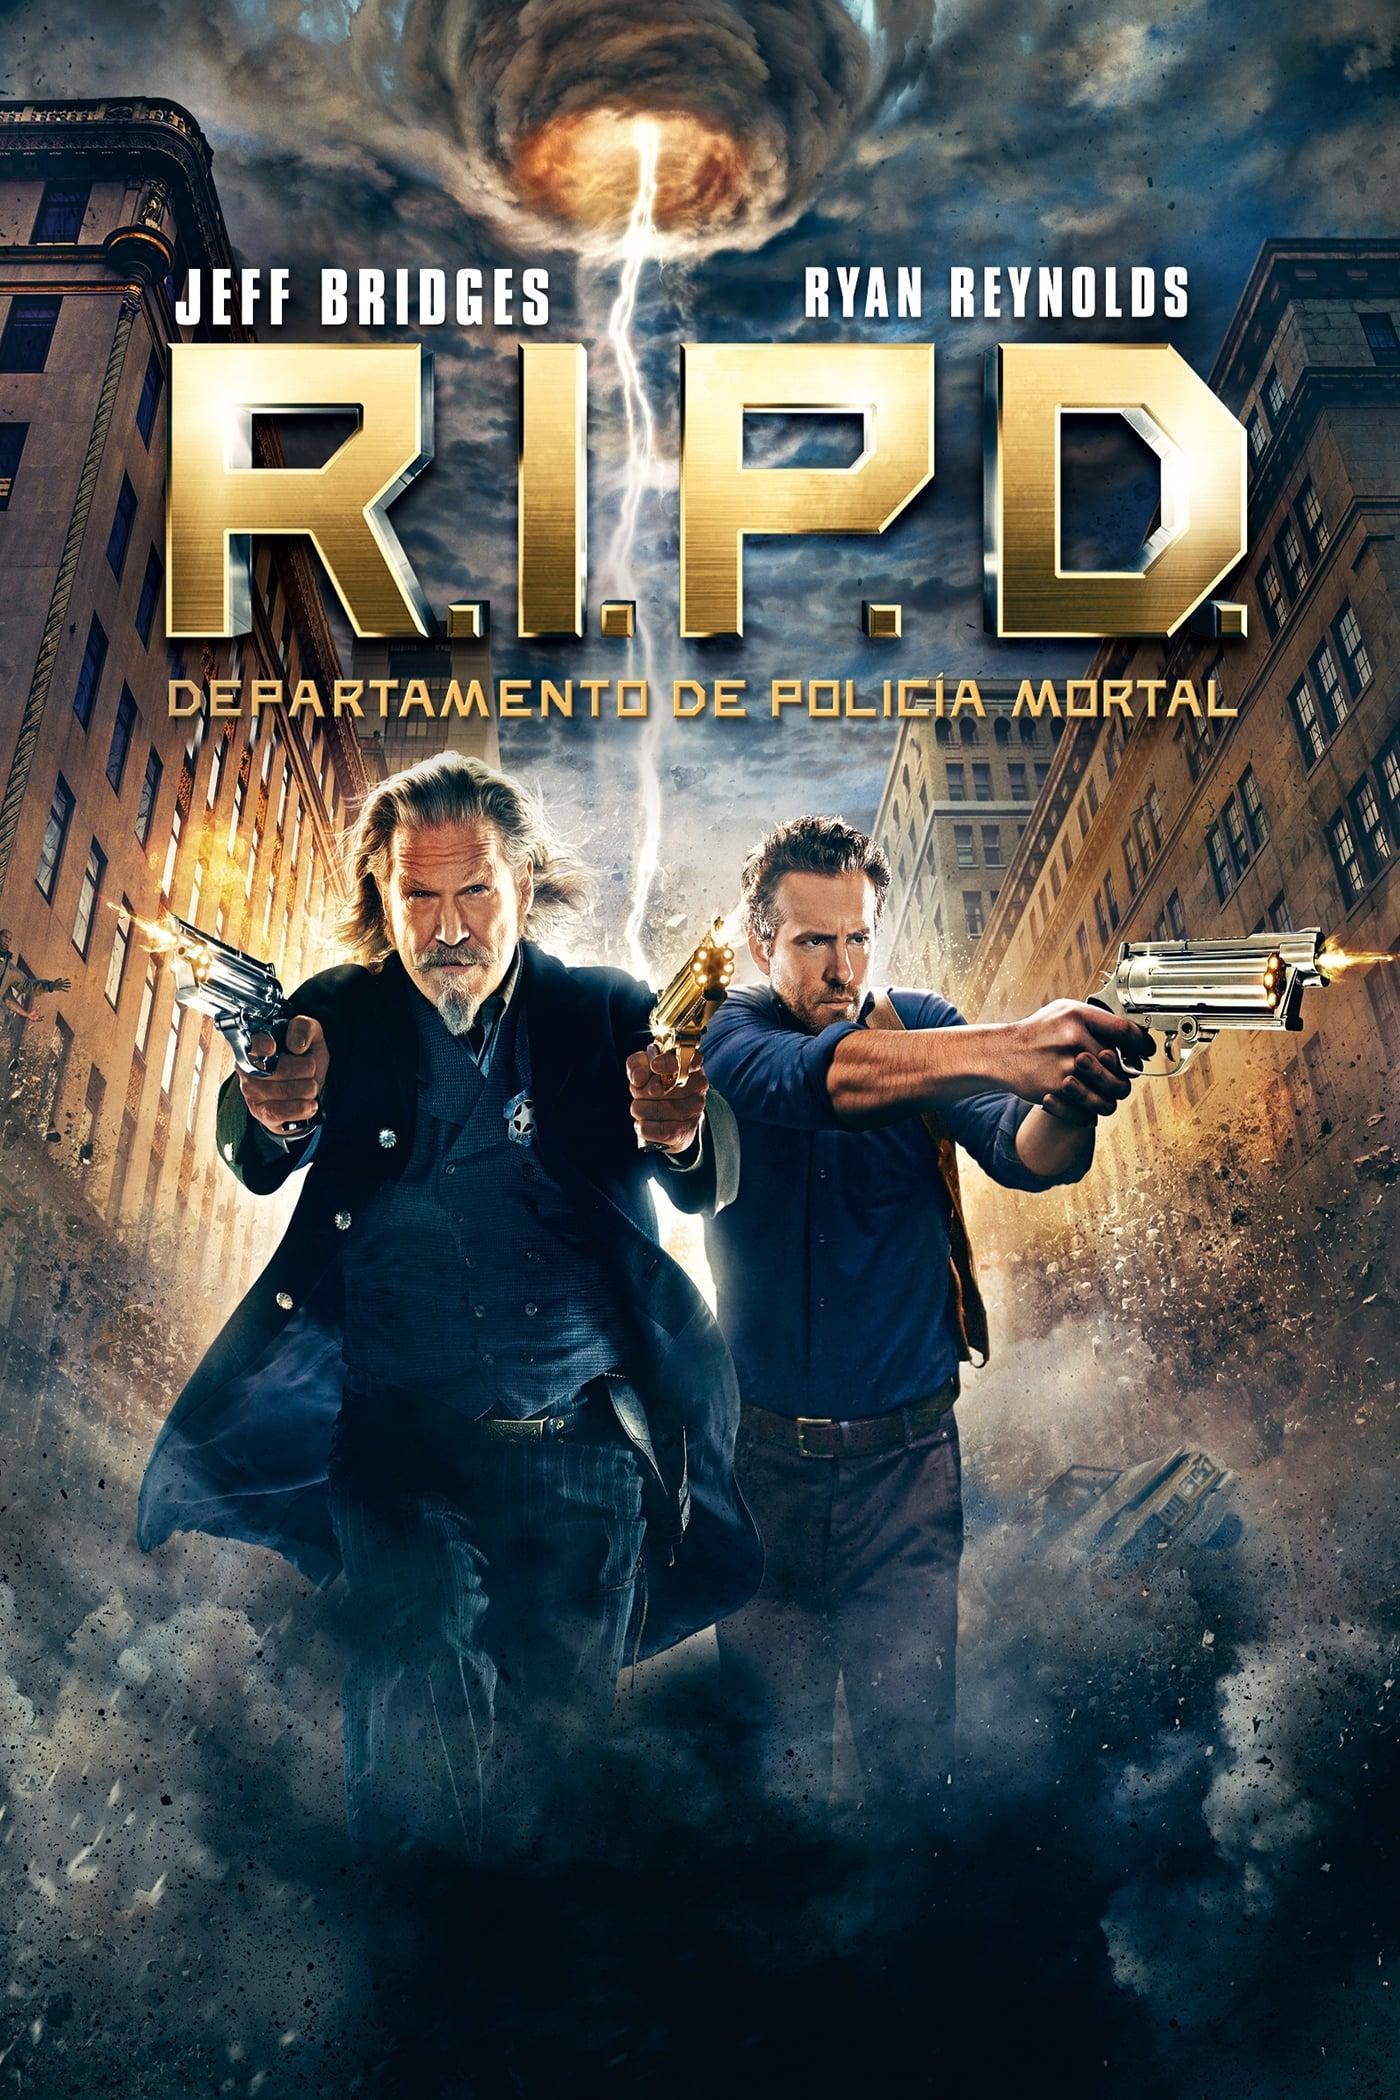 R.I.P.D. Departamento de Policía Mortal poster